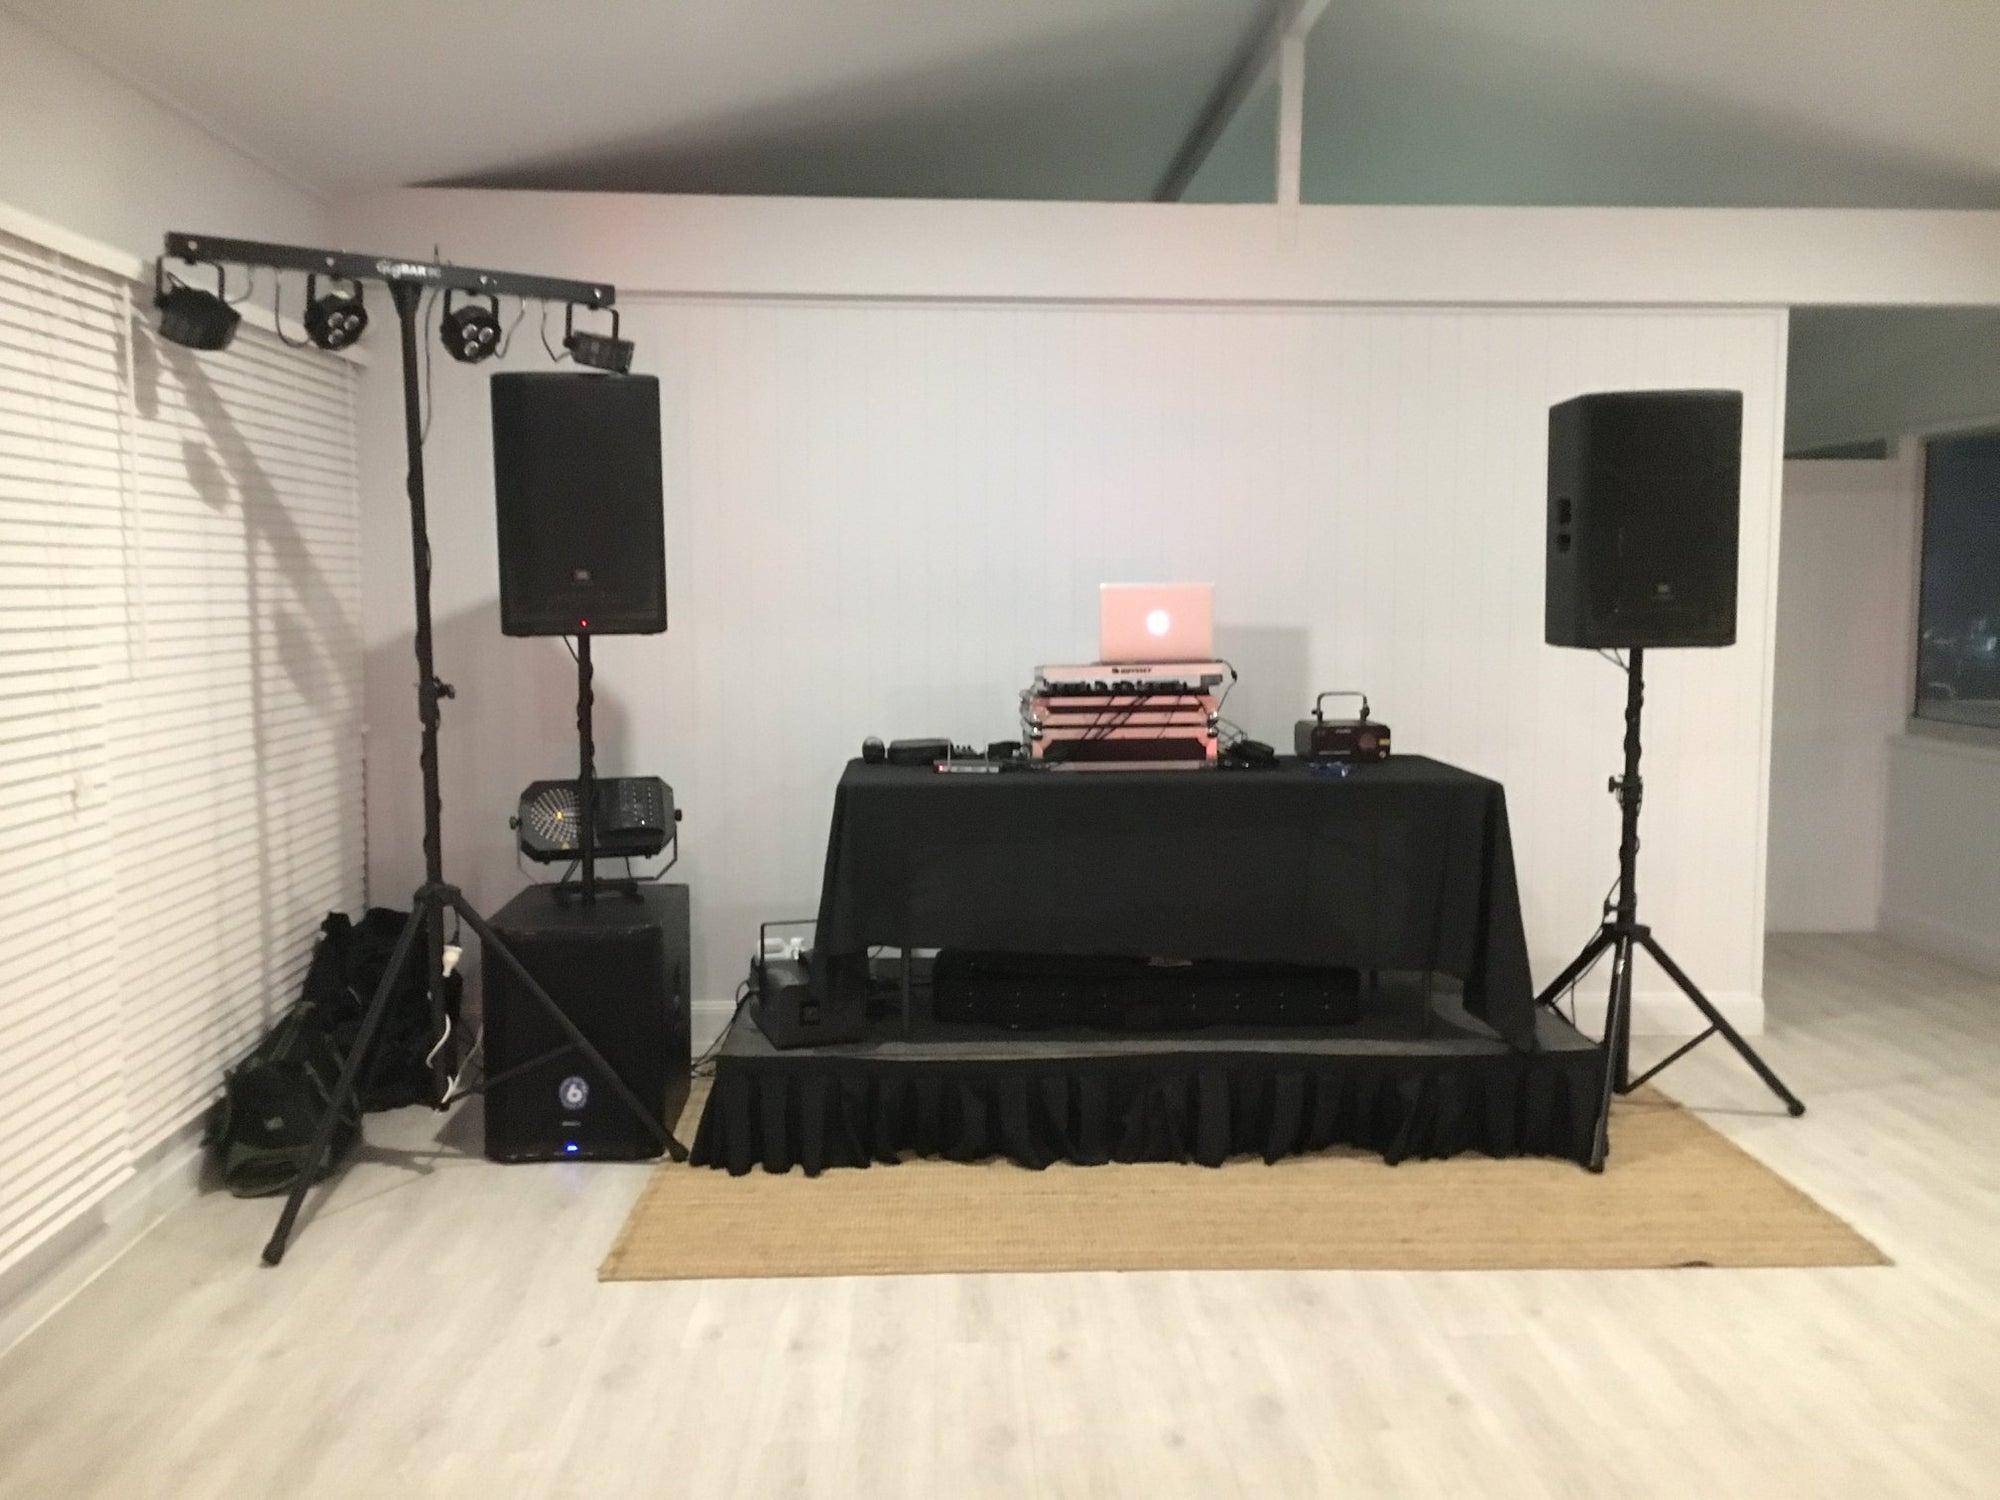 Pier 33 Mooloolaba Mudcrab Music & Events AV Hire